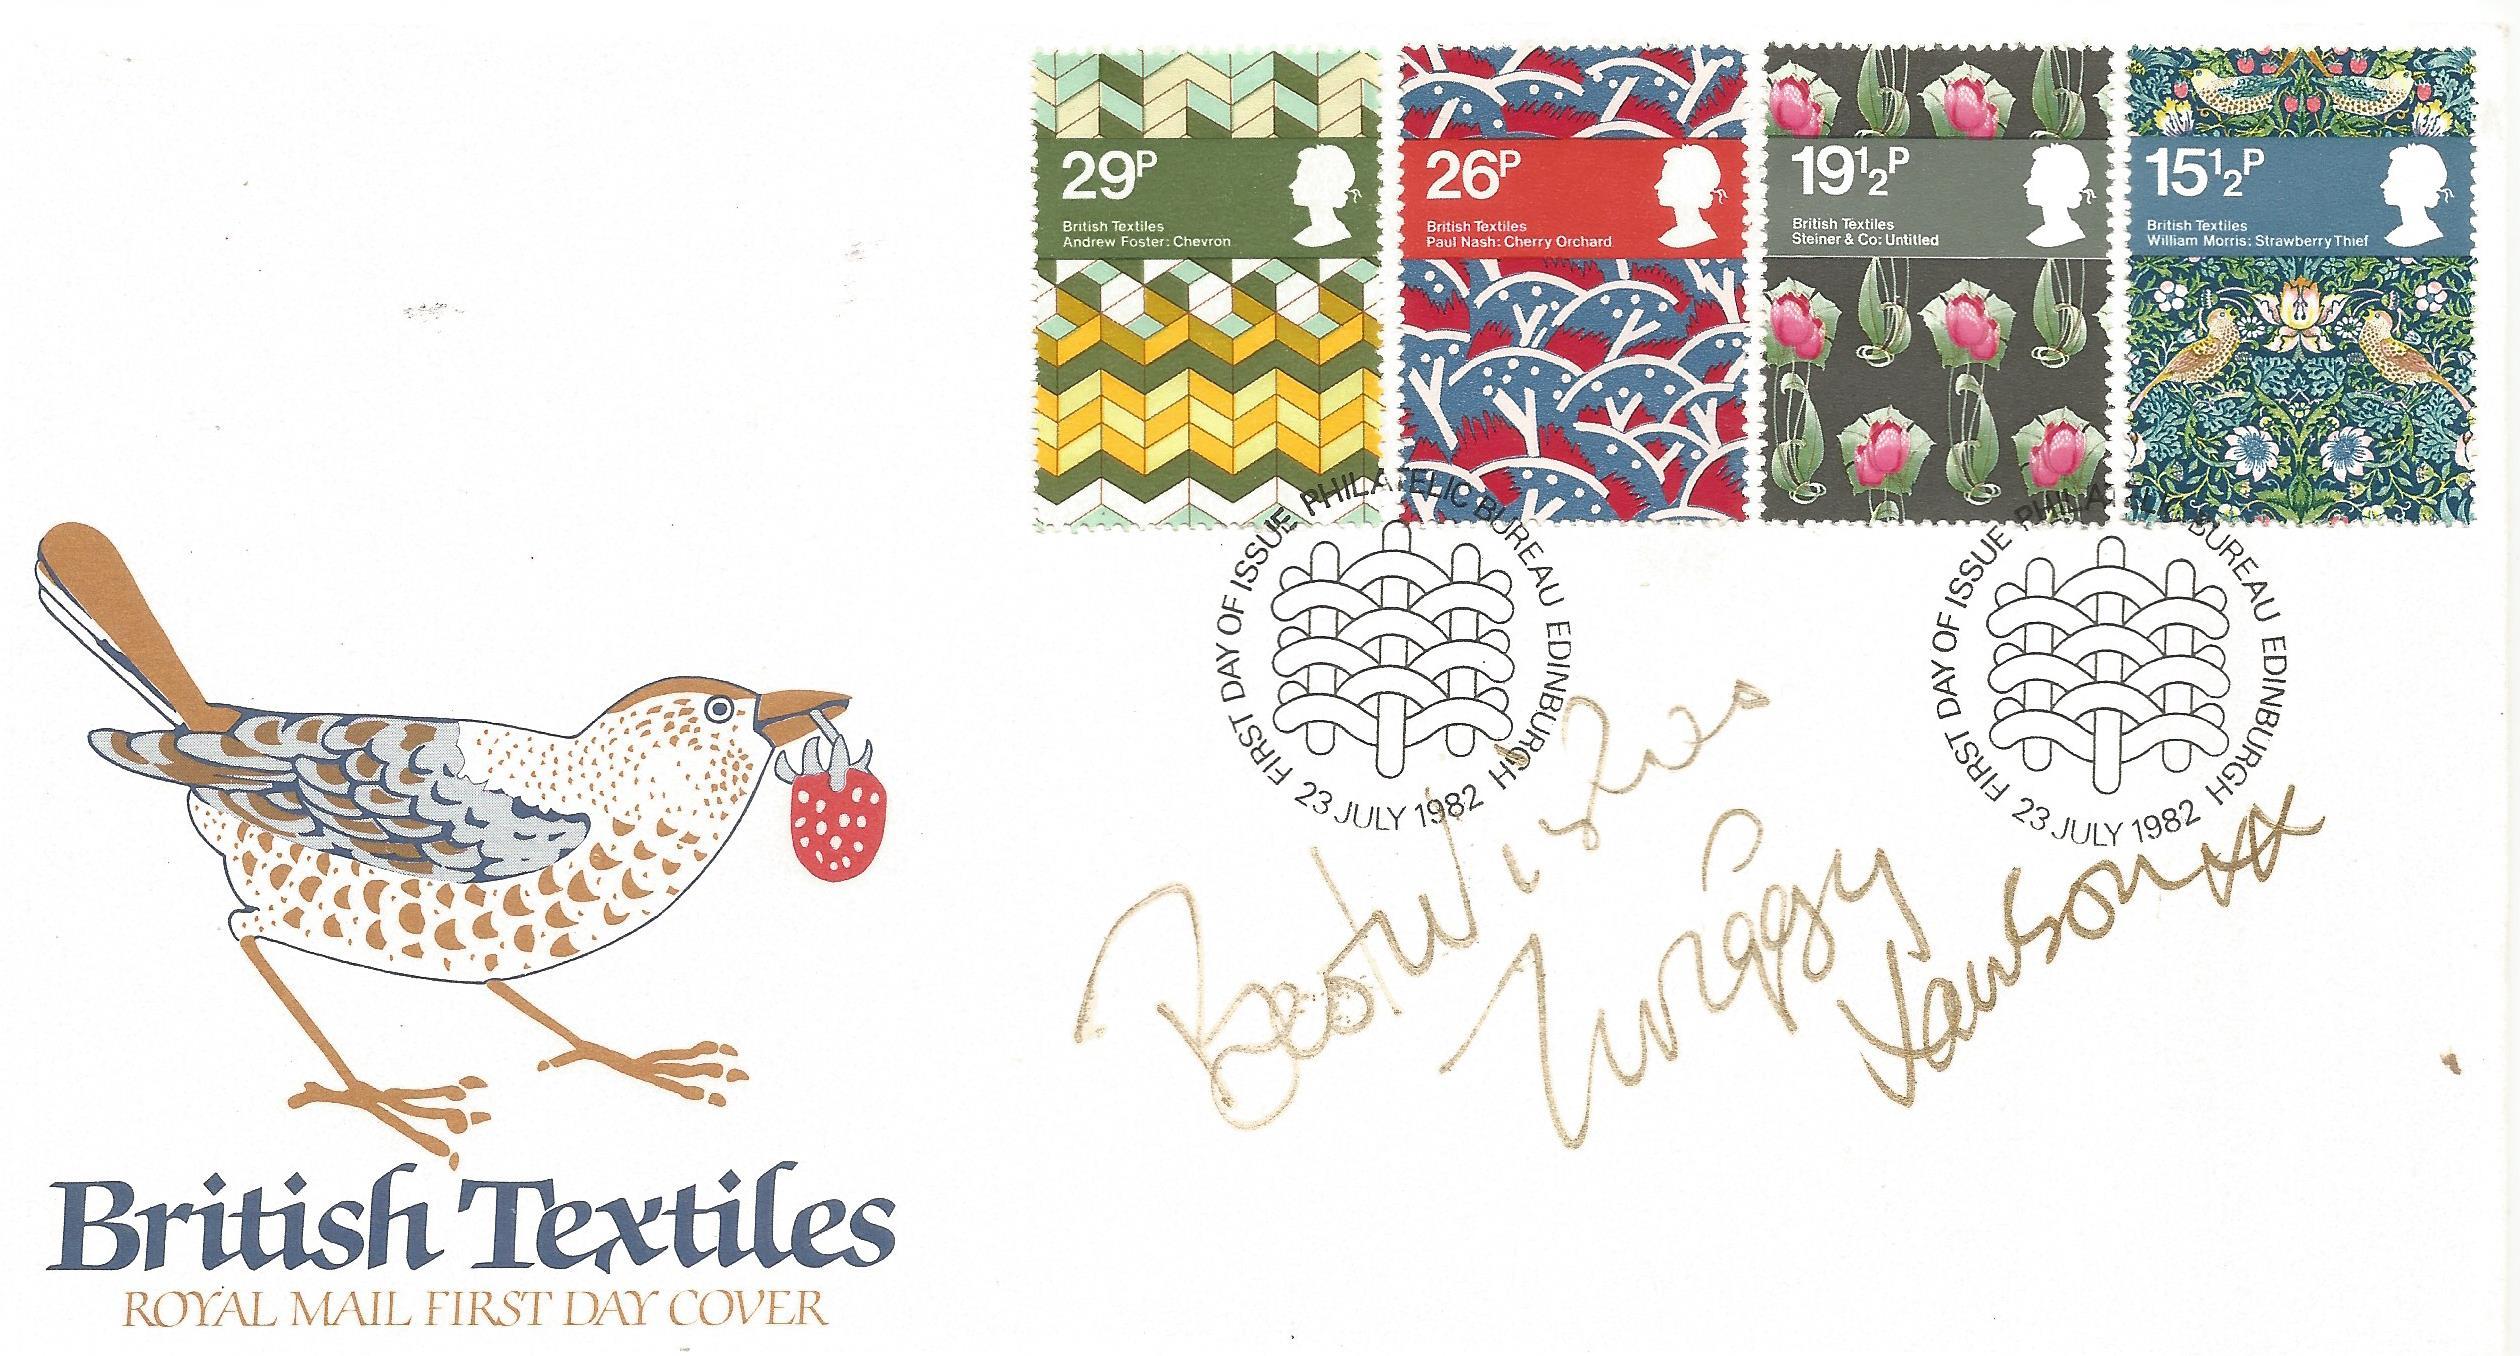 Dame Twiggy Lawson signed British Textiles Royal Mail FDC PM Philatelic Bureau Edinburgh 23 July